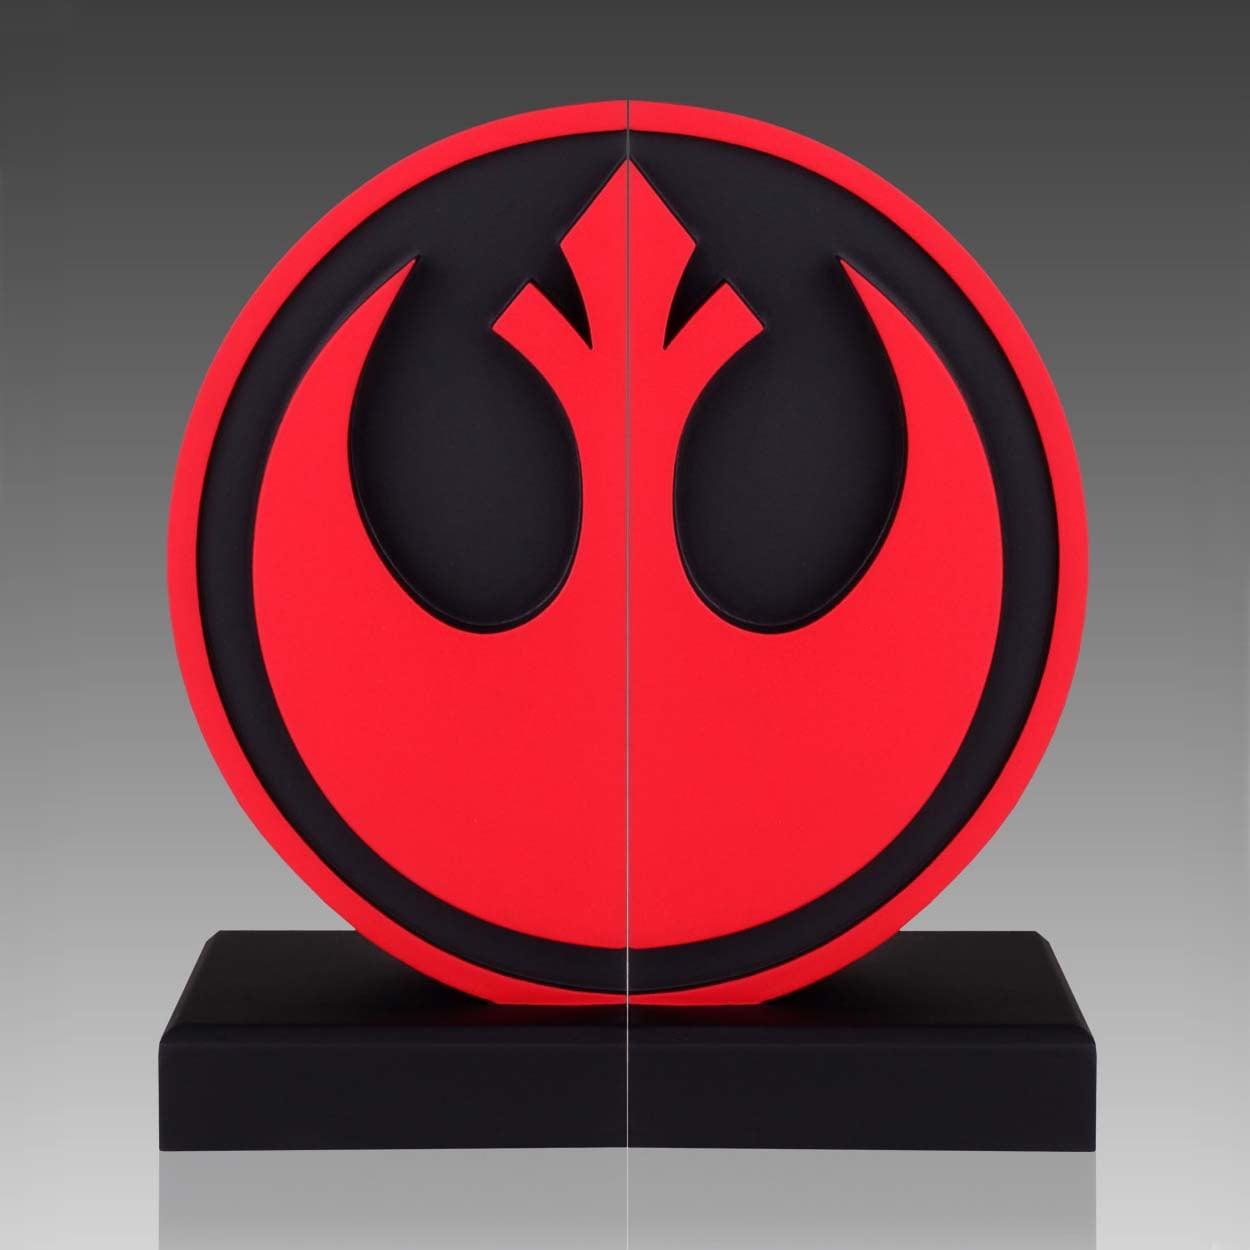 Star wars serre livres rebel seal - Serre livre star wars ...